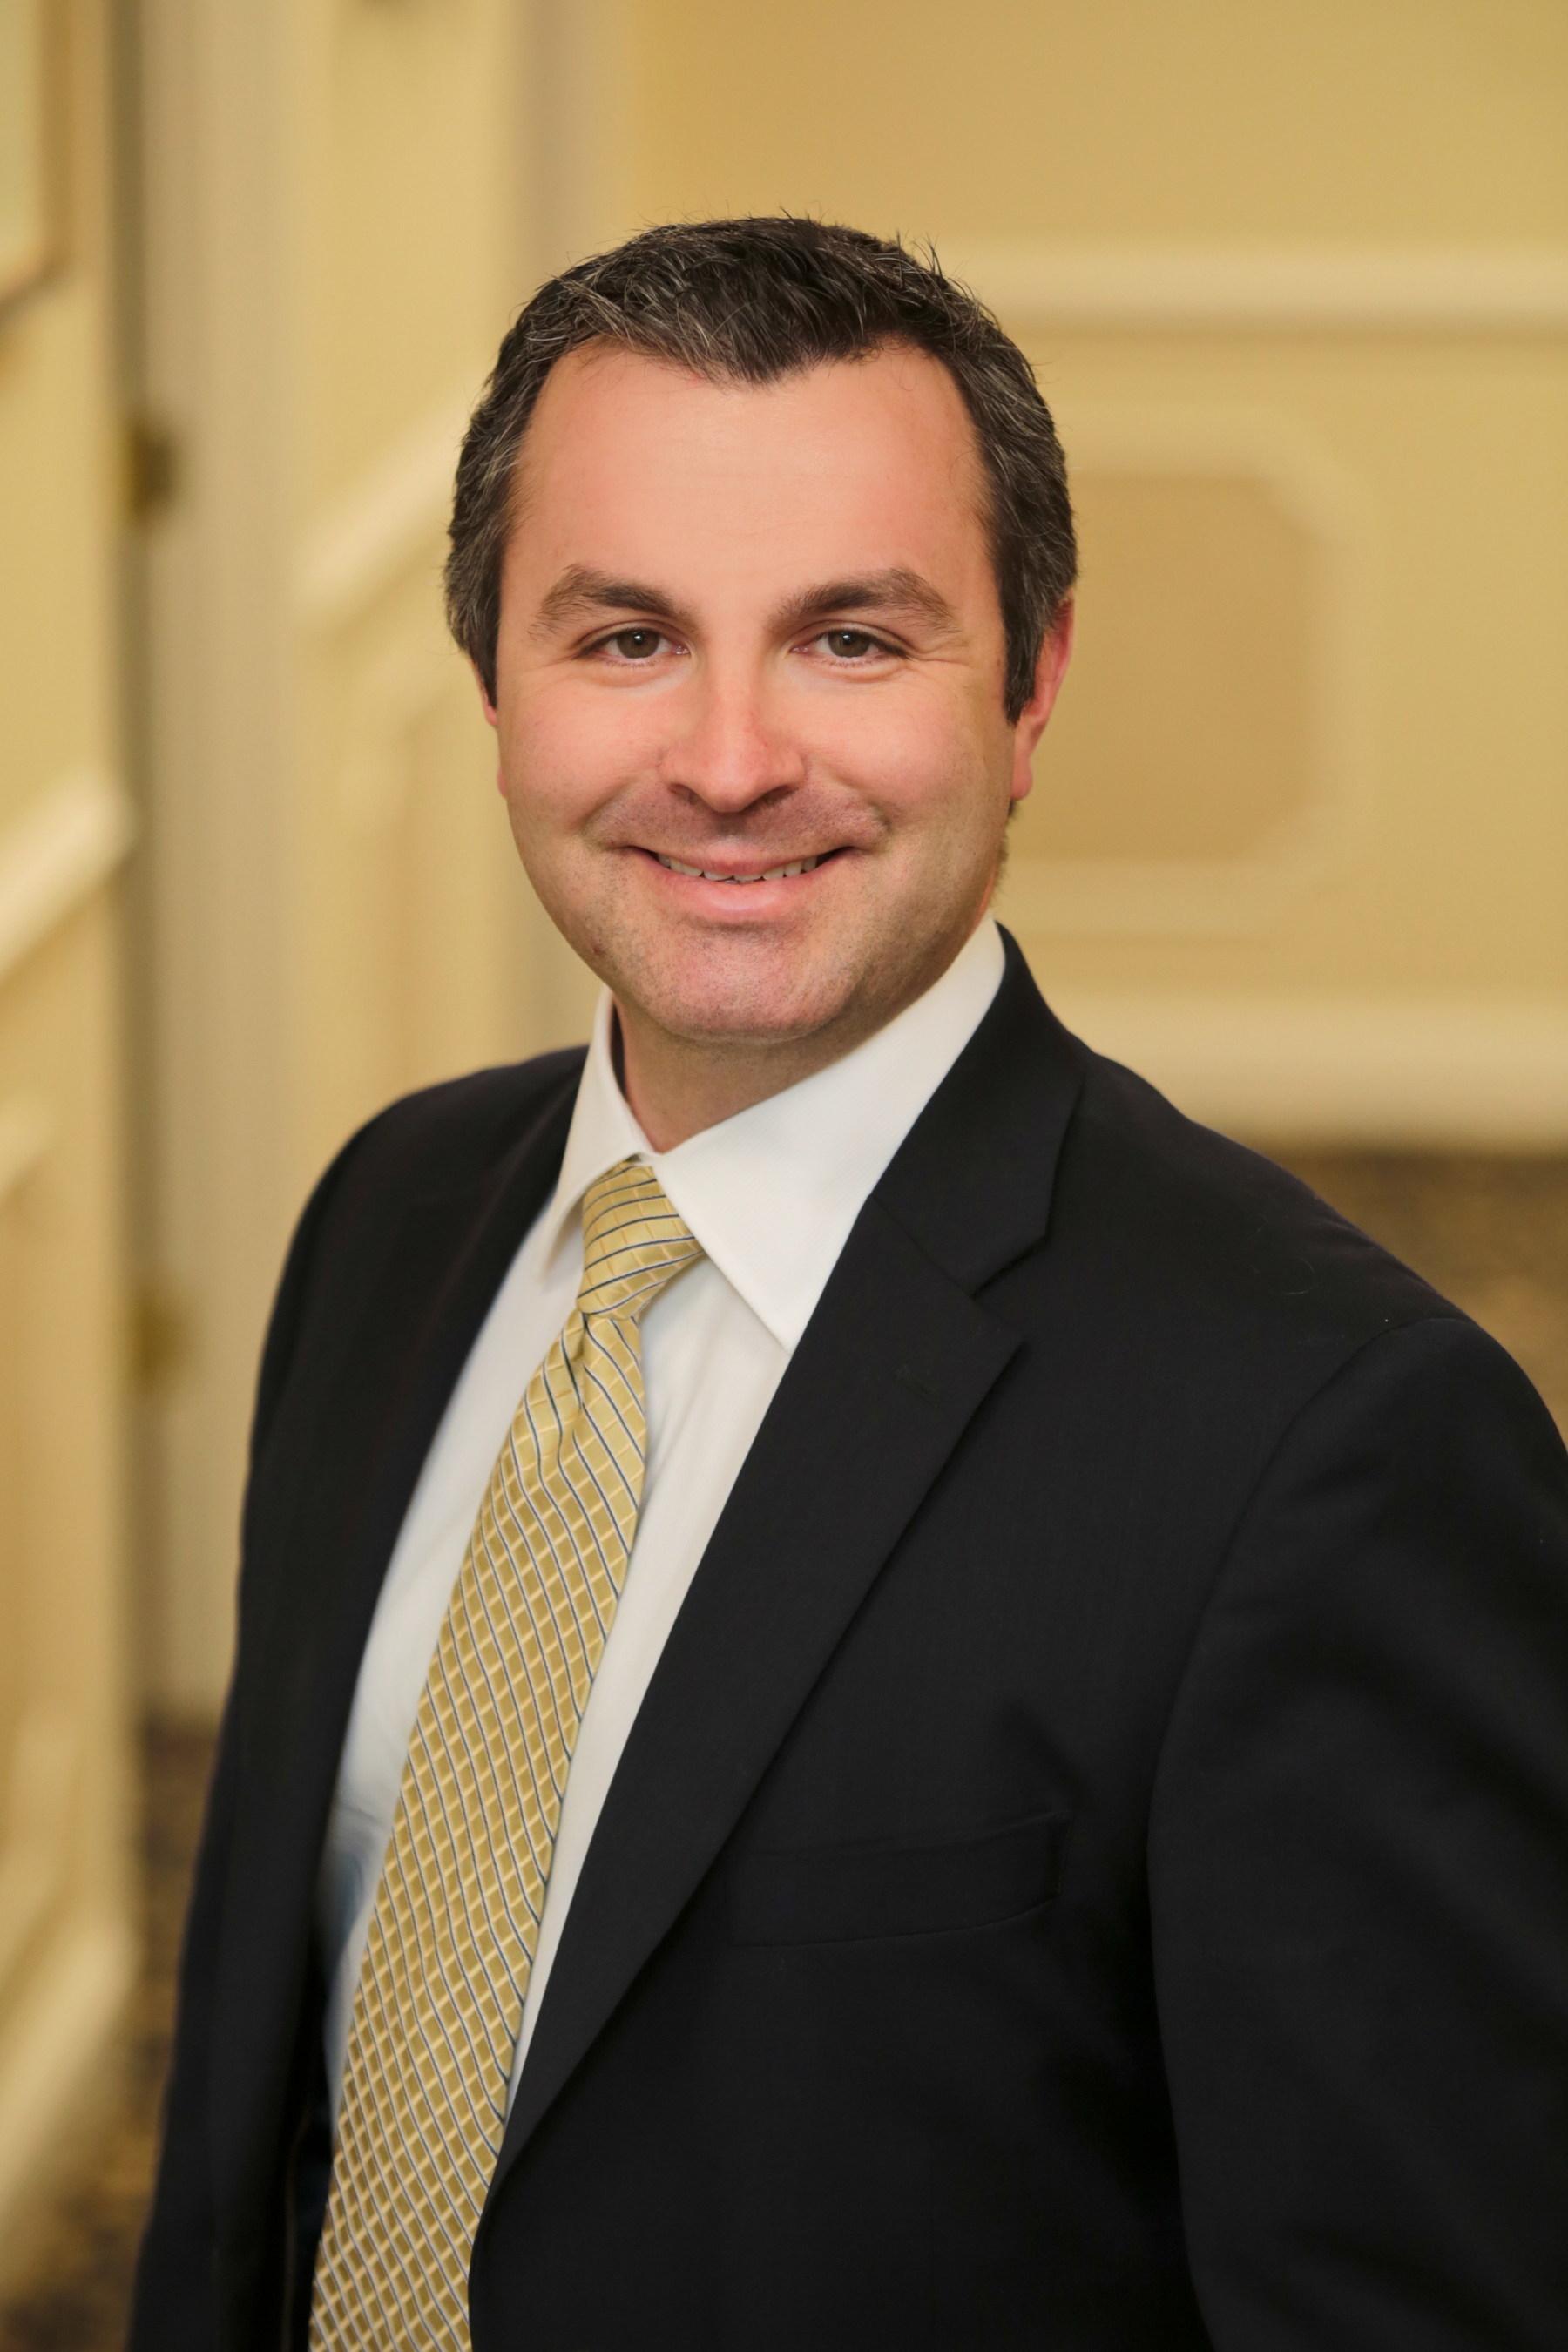 John-Patrick L. Sollock, Investment Associate, Infinex Investments, Inc., Community Wealth Advisors